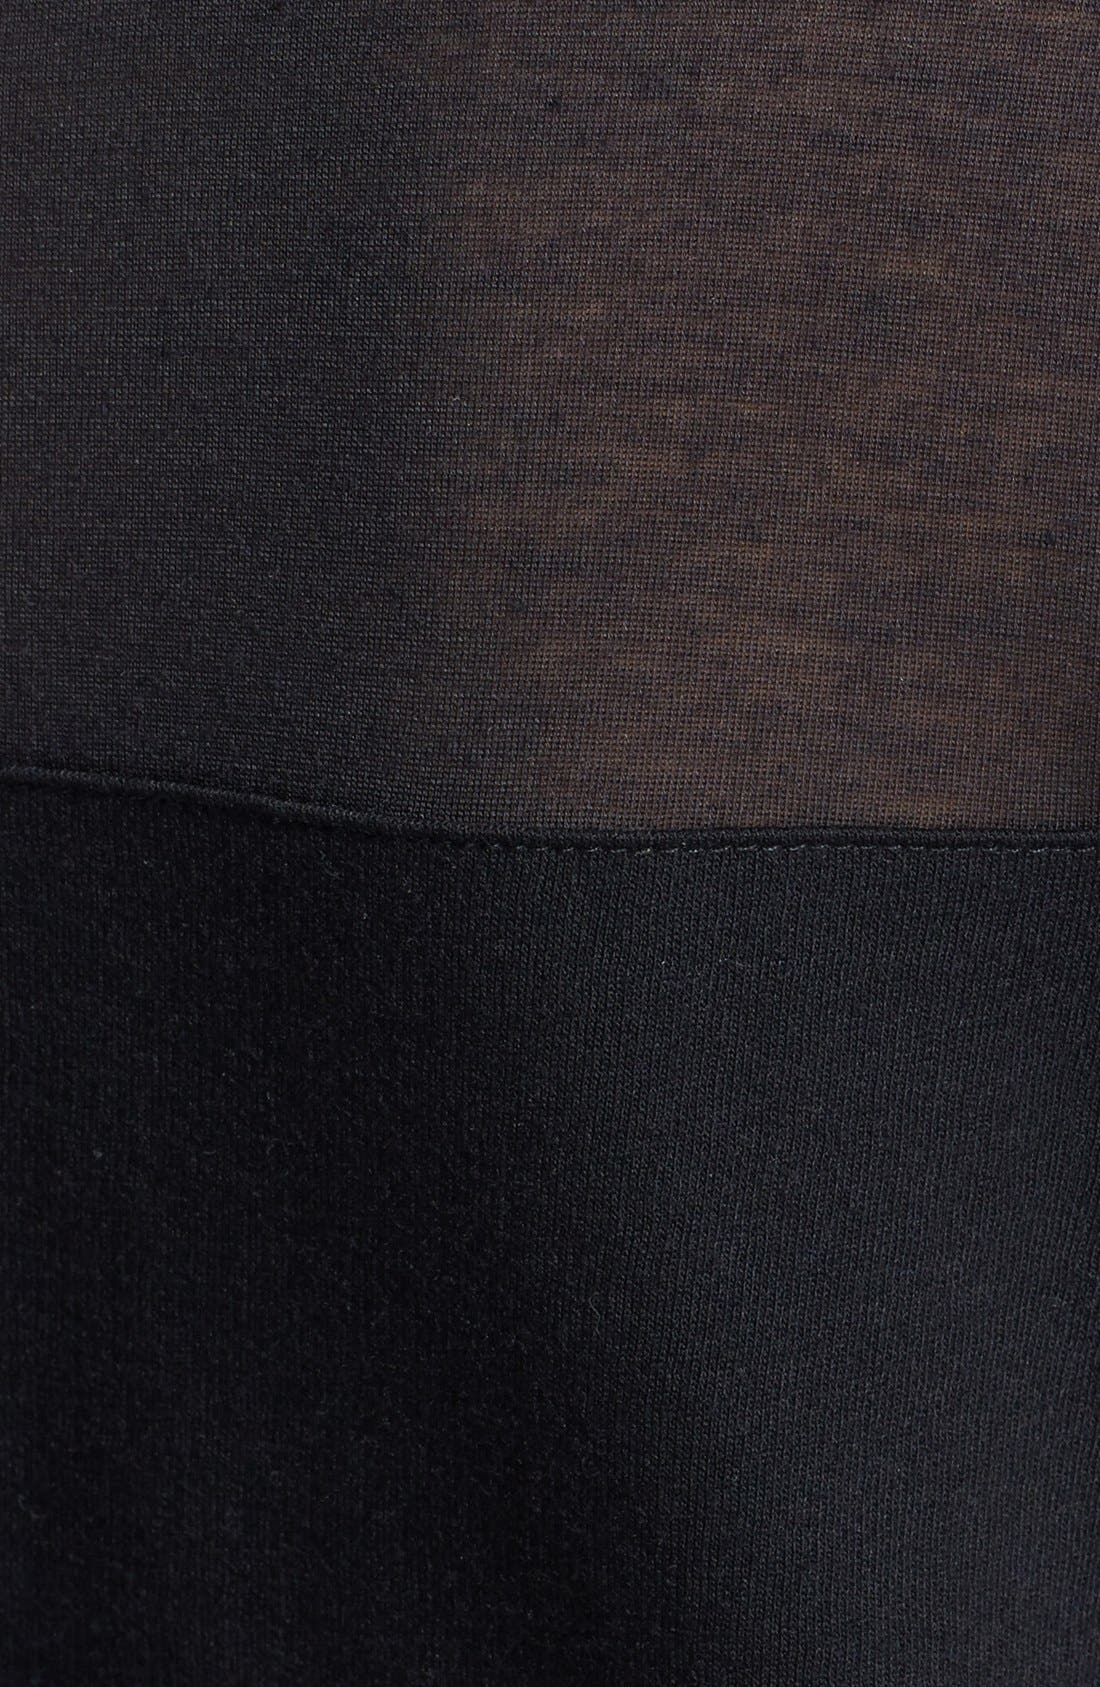 Sheer Yoke Sweatshirt,                             Alternate thumbnail 3, color,                             001